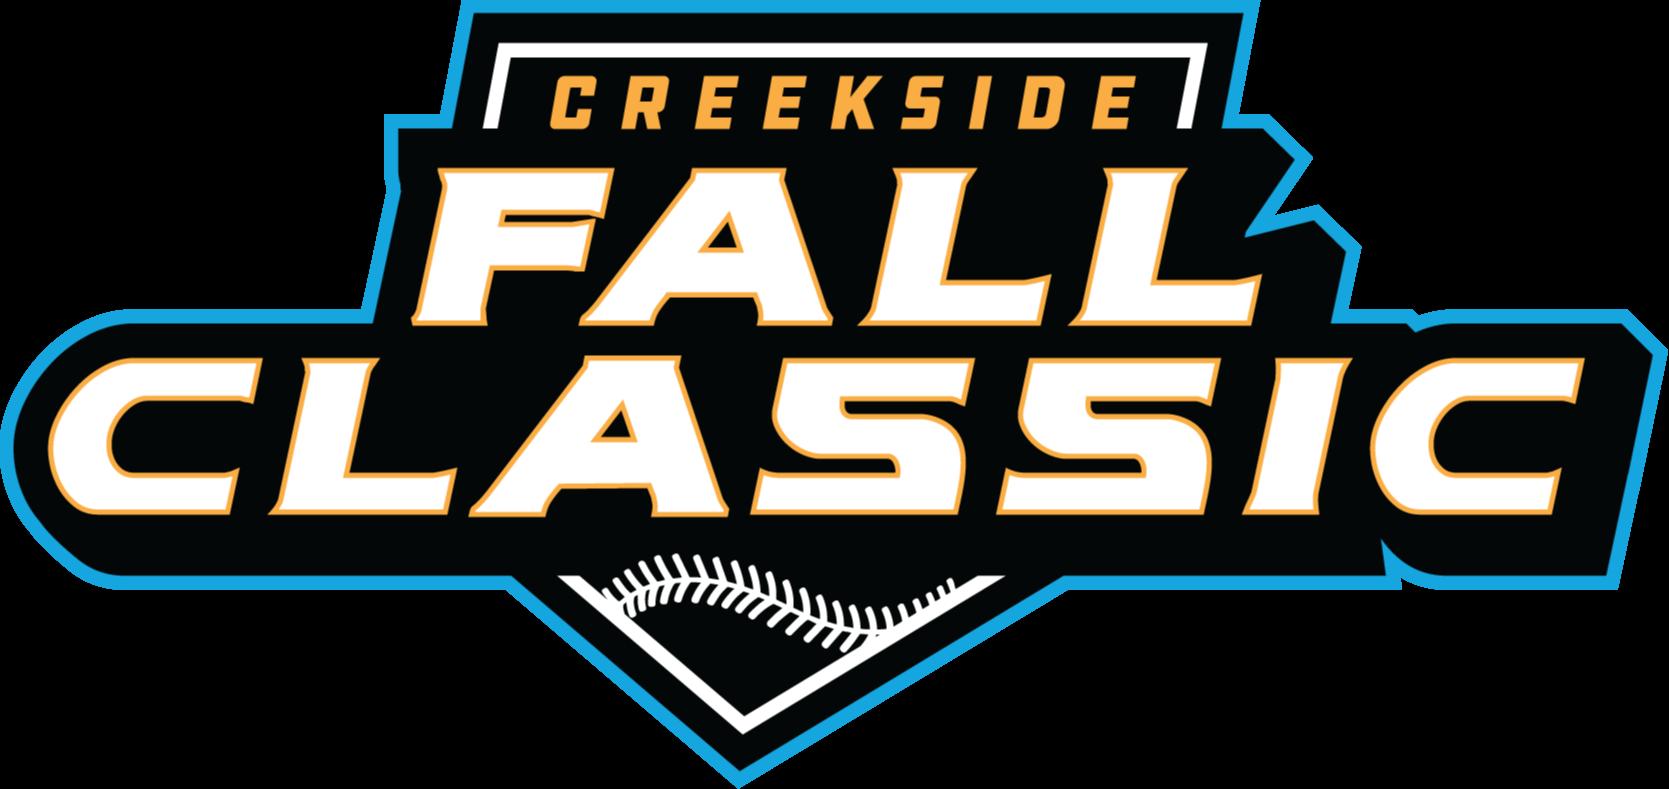 Creekside Fall Classic